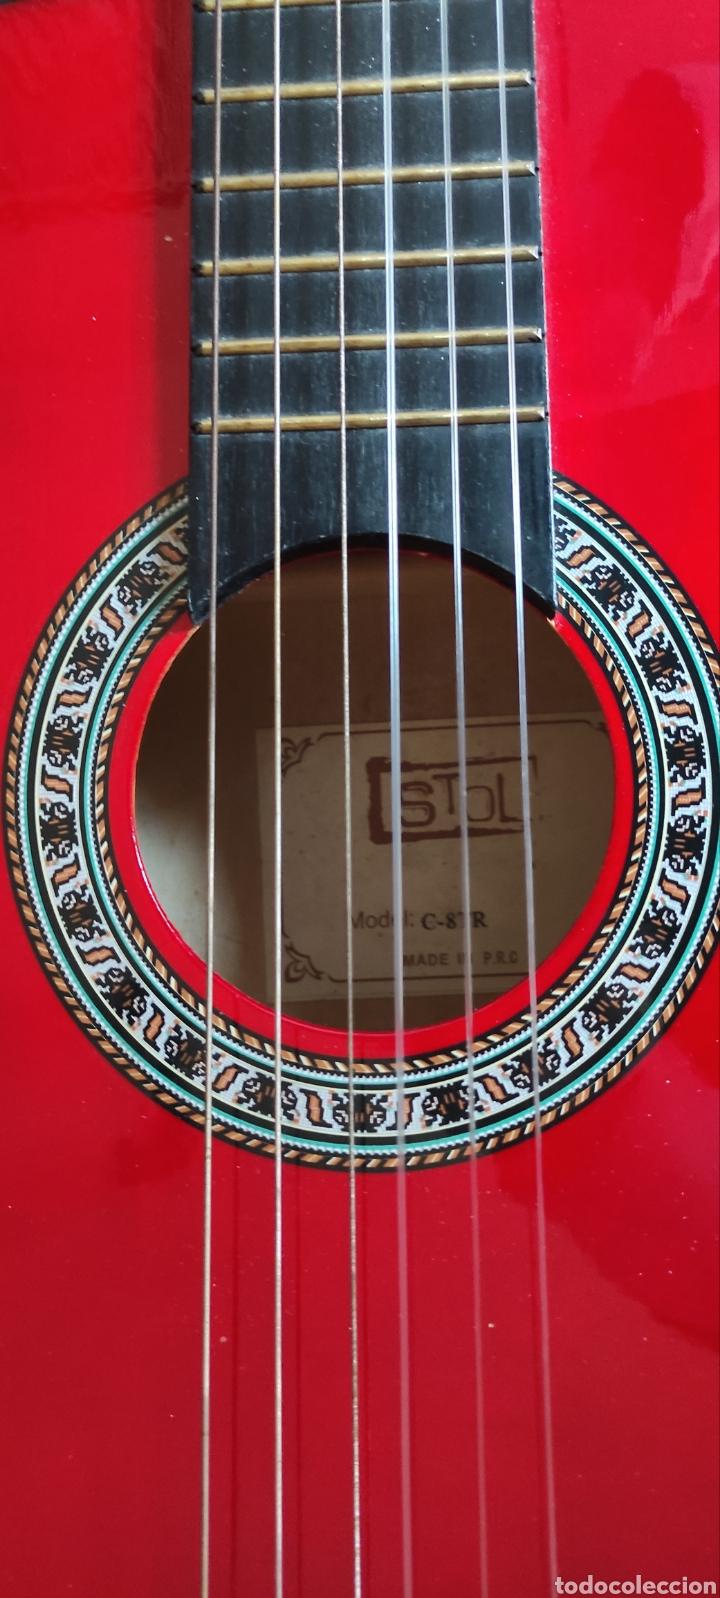 Instrumentos musicales: Guitarra - Foto 16 - 228417015